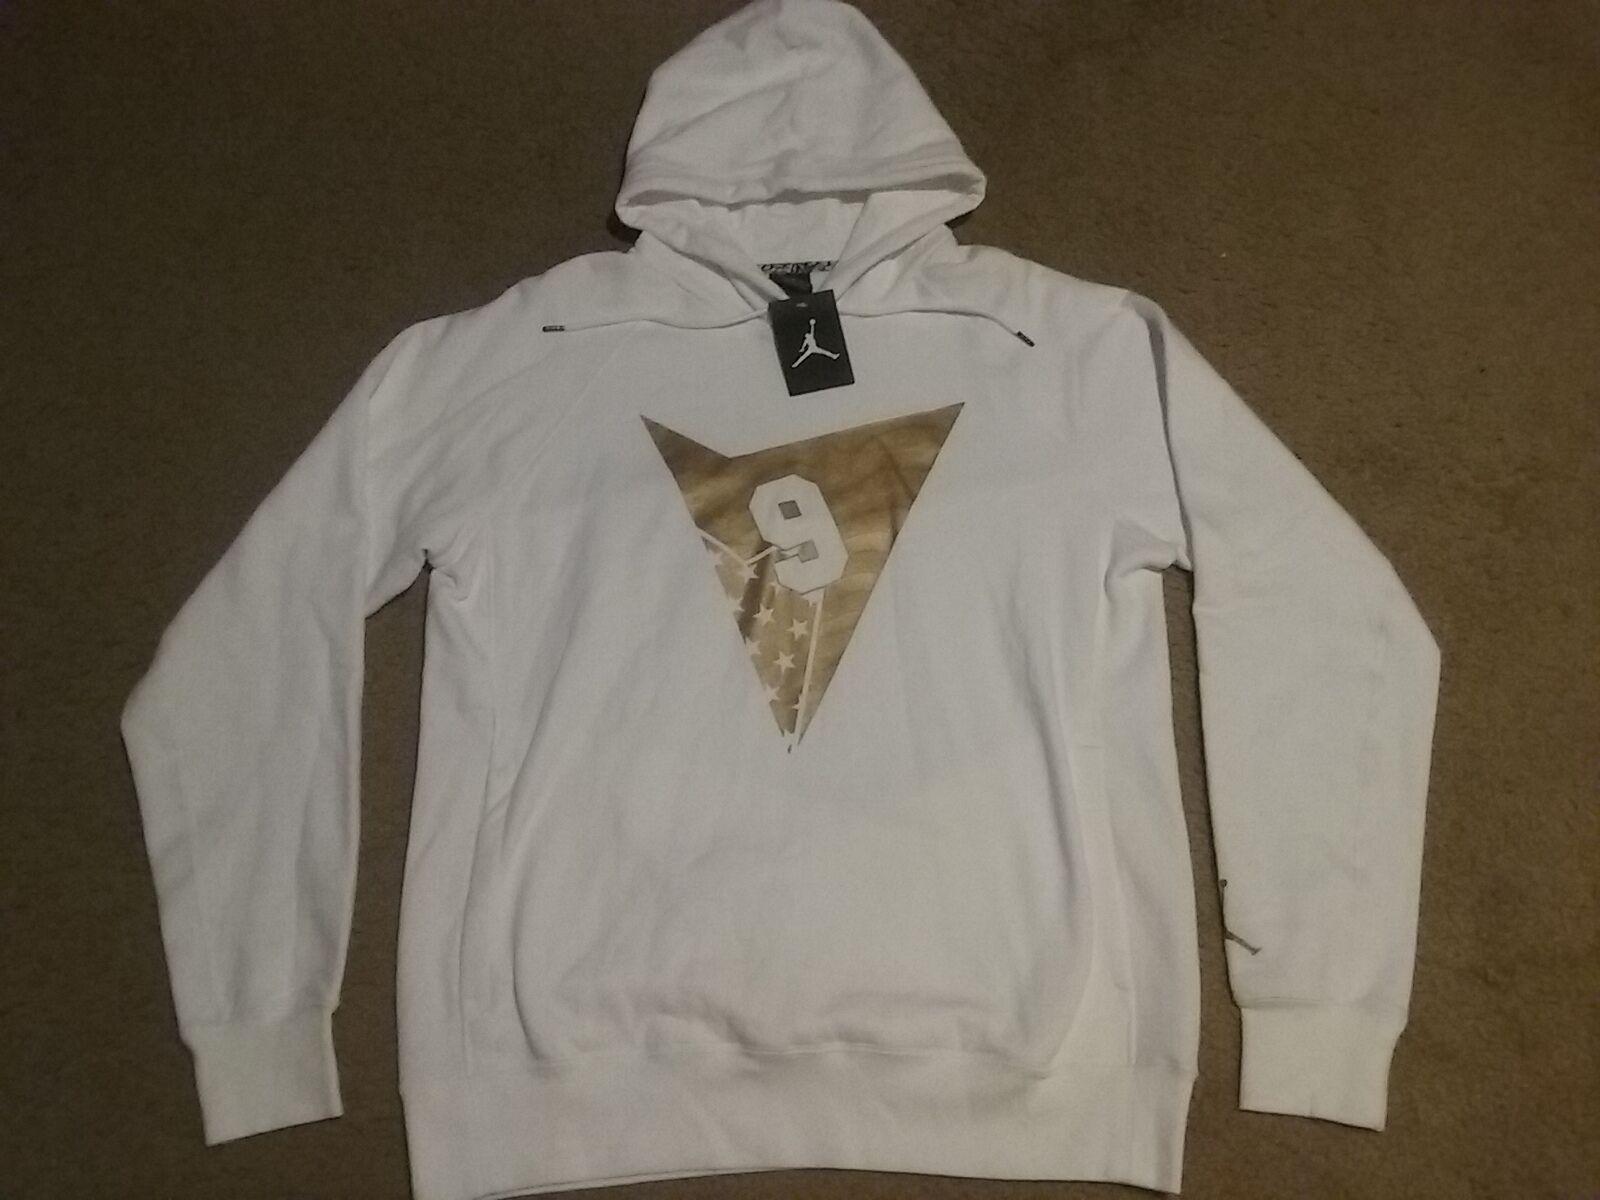 jordan aj 7 stars and stripes hoodie